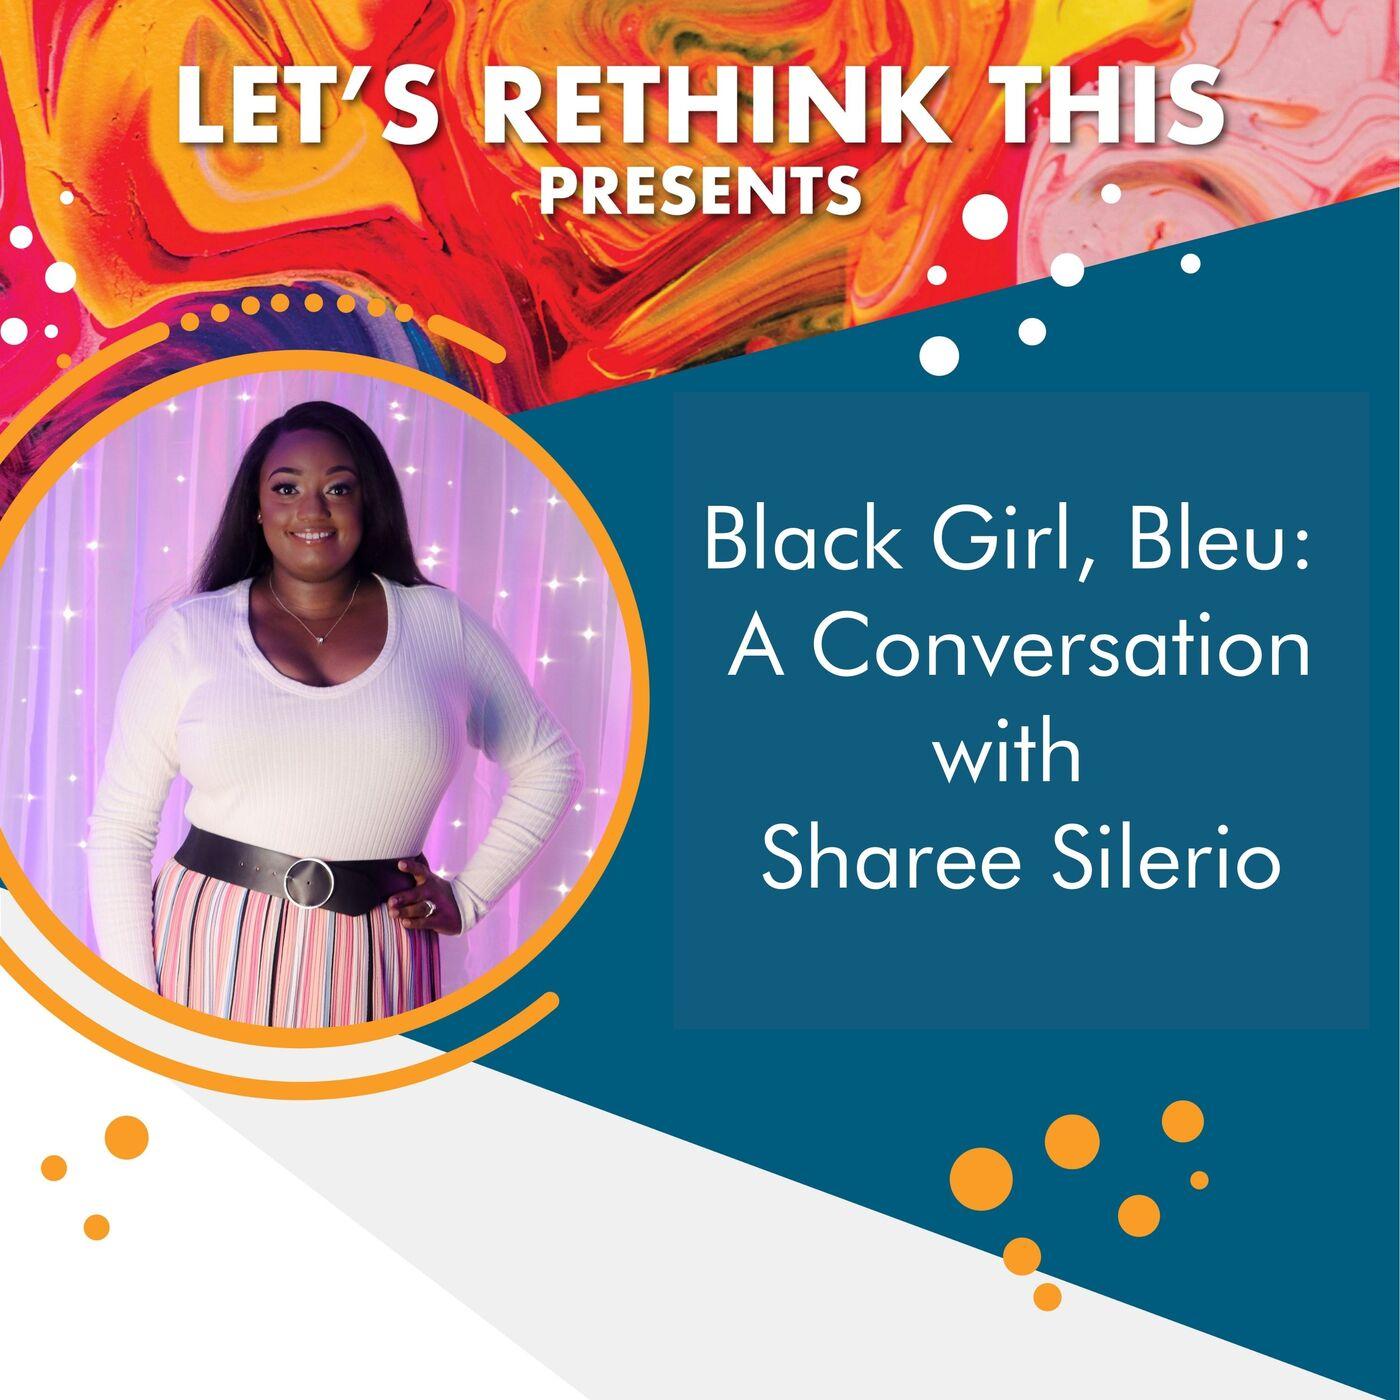 Black Girl, Bleu